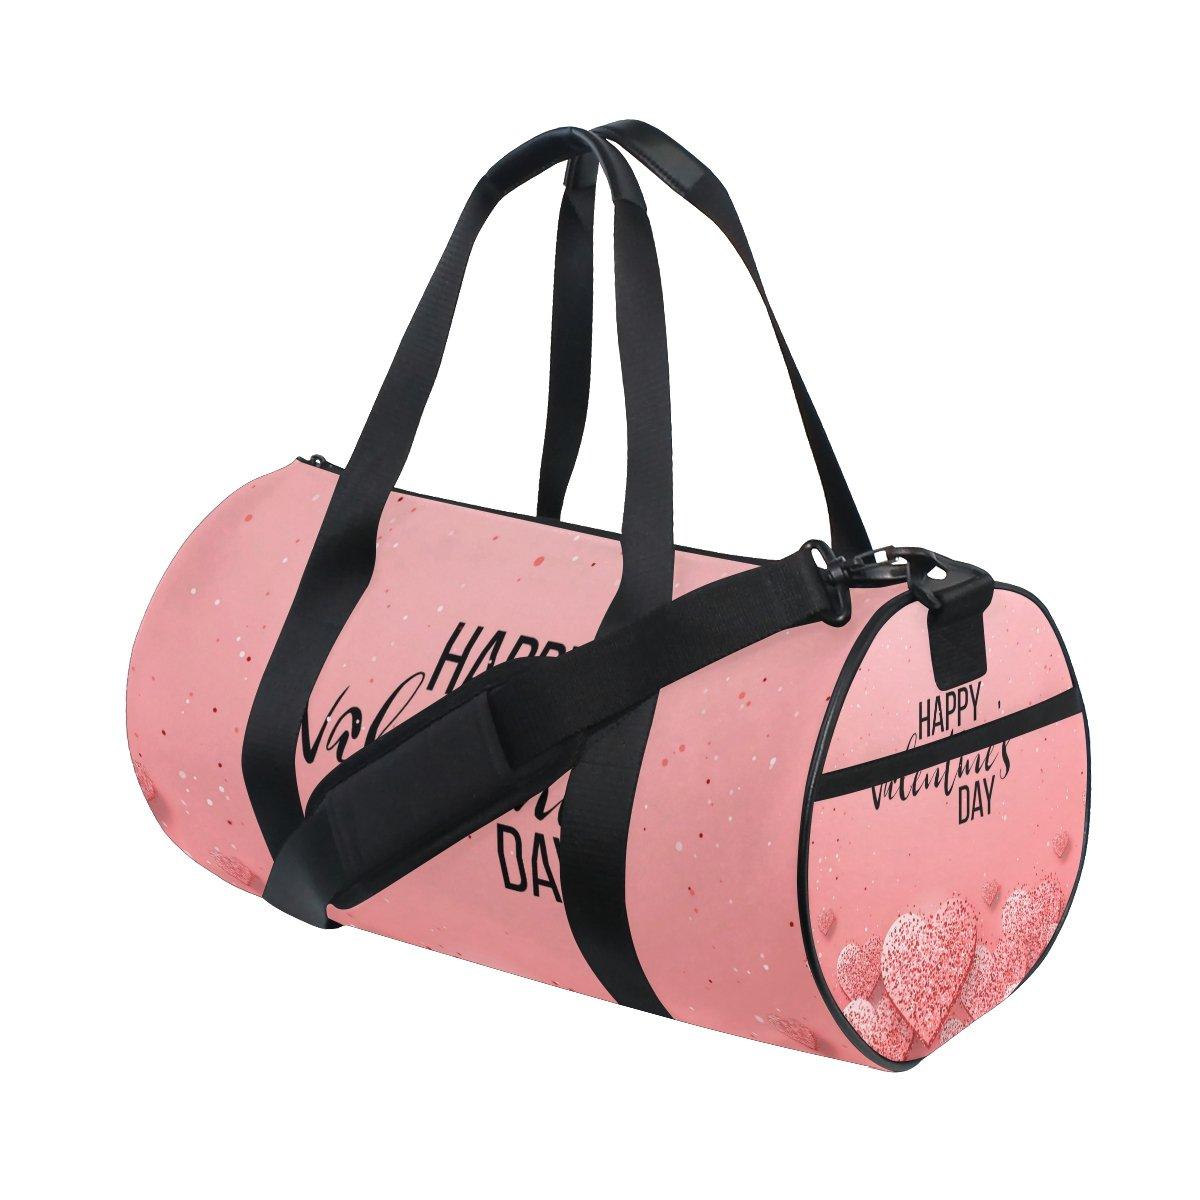 U LIFE Happy Valentines Day Floral Flowers Love Heart Sports Gym Shoulder Handy Duffel Bags for Women Men Kids Boys Girls